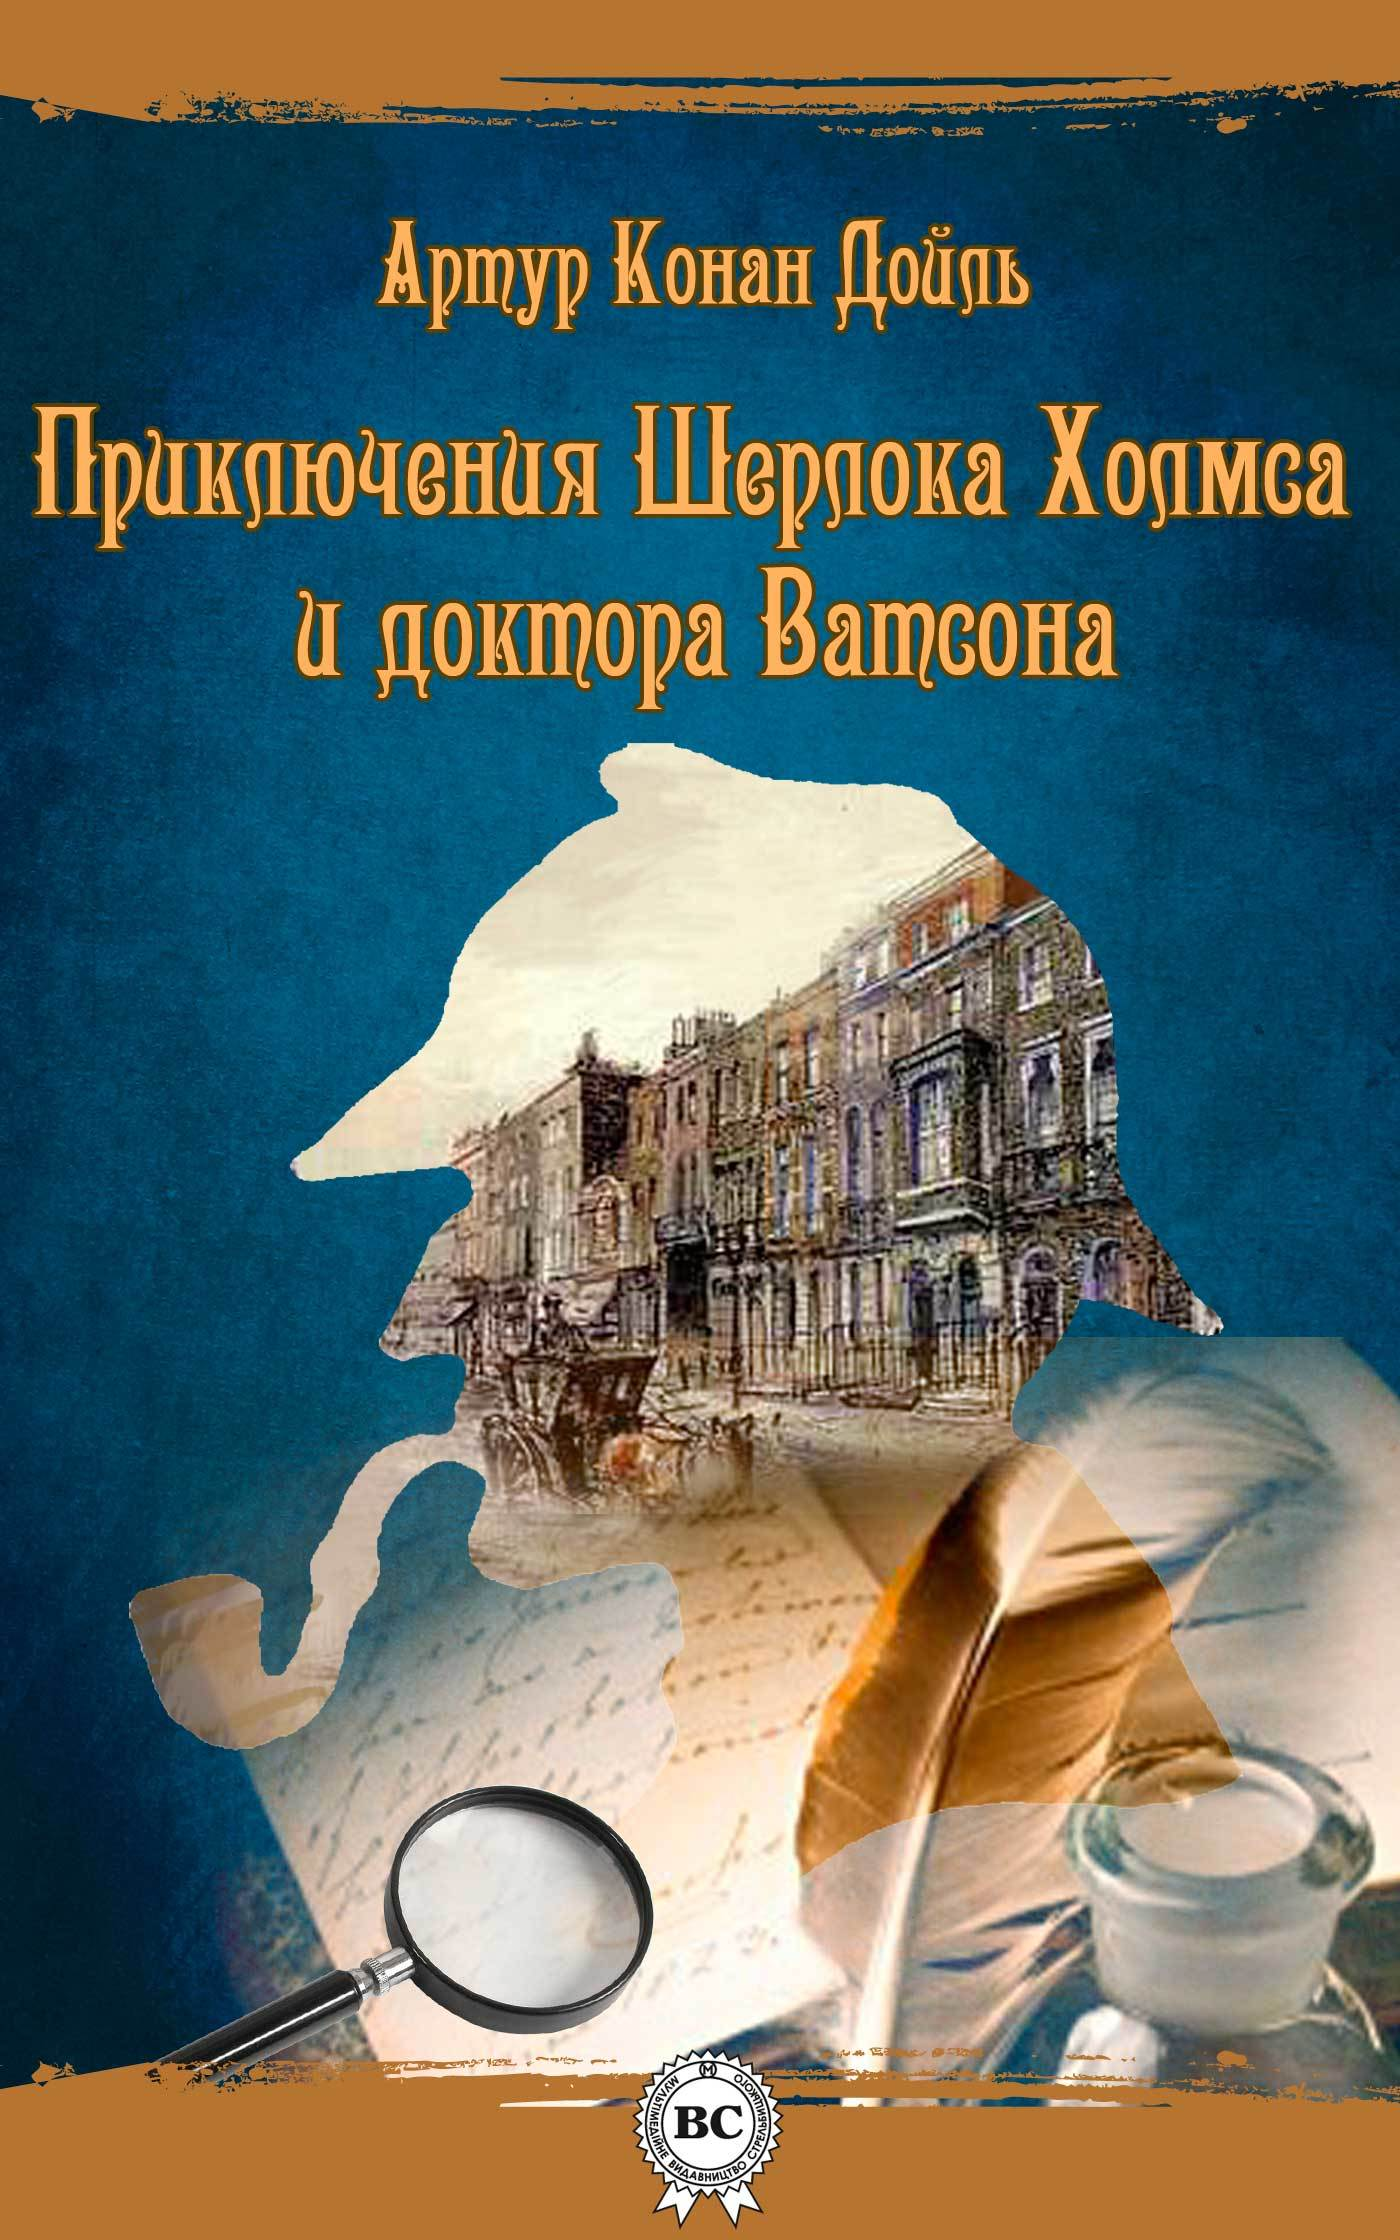 Артур Конан Дойл Приключения Шерлока Холмса и доктора Ватсона дойл а к записки о шерлоке холмсе